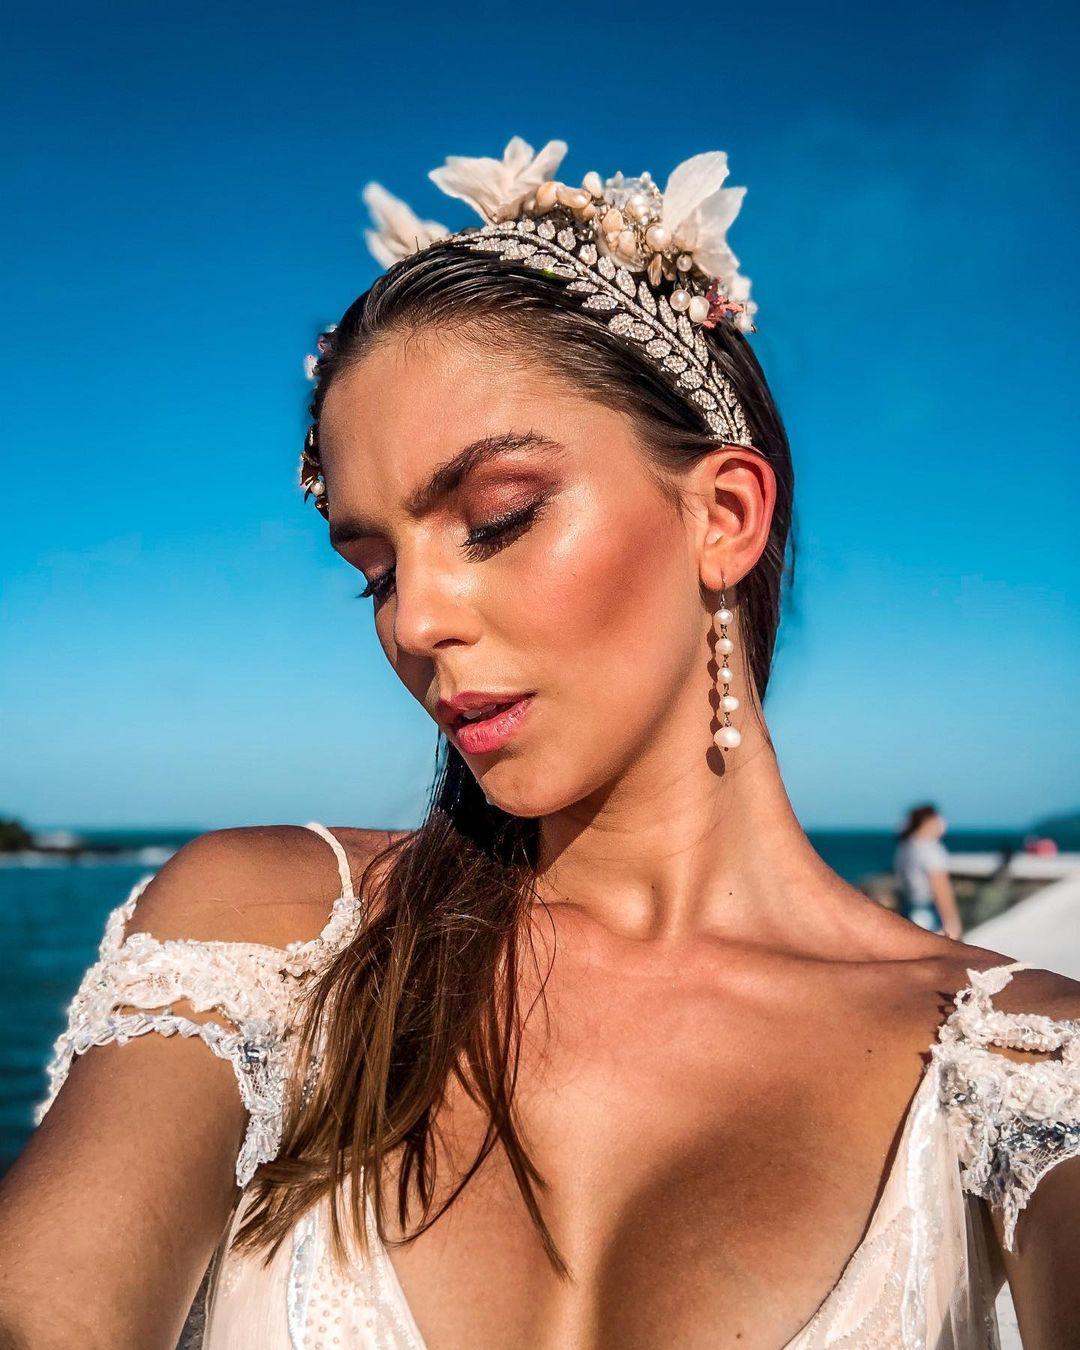 ana flavia giacomini, miss ilha dos lobos mundo 2019. Fvog4910